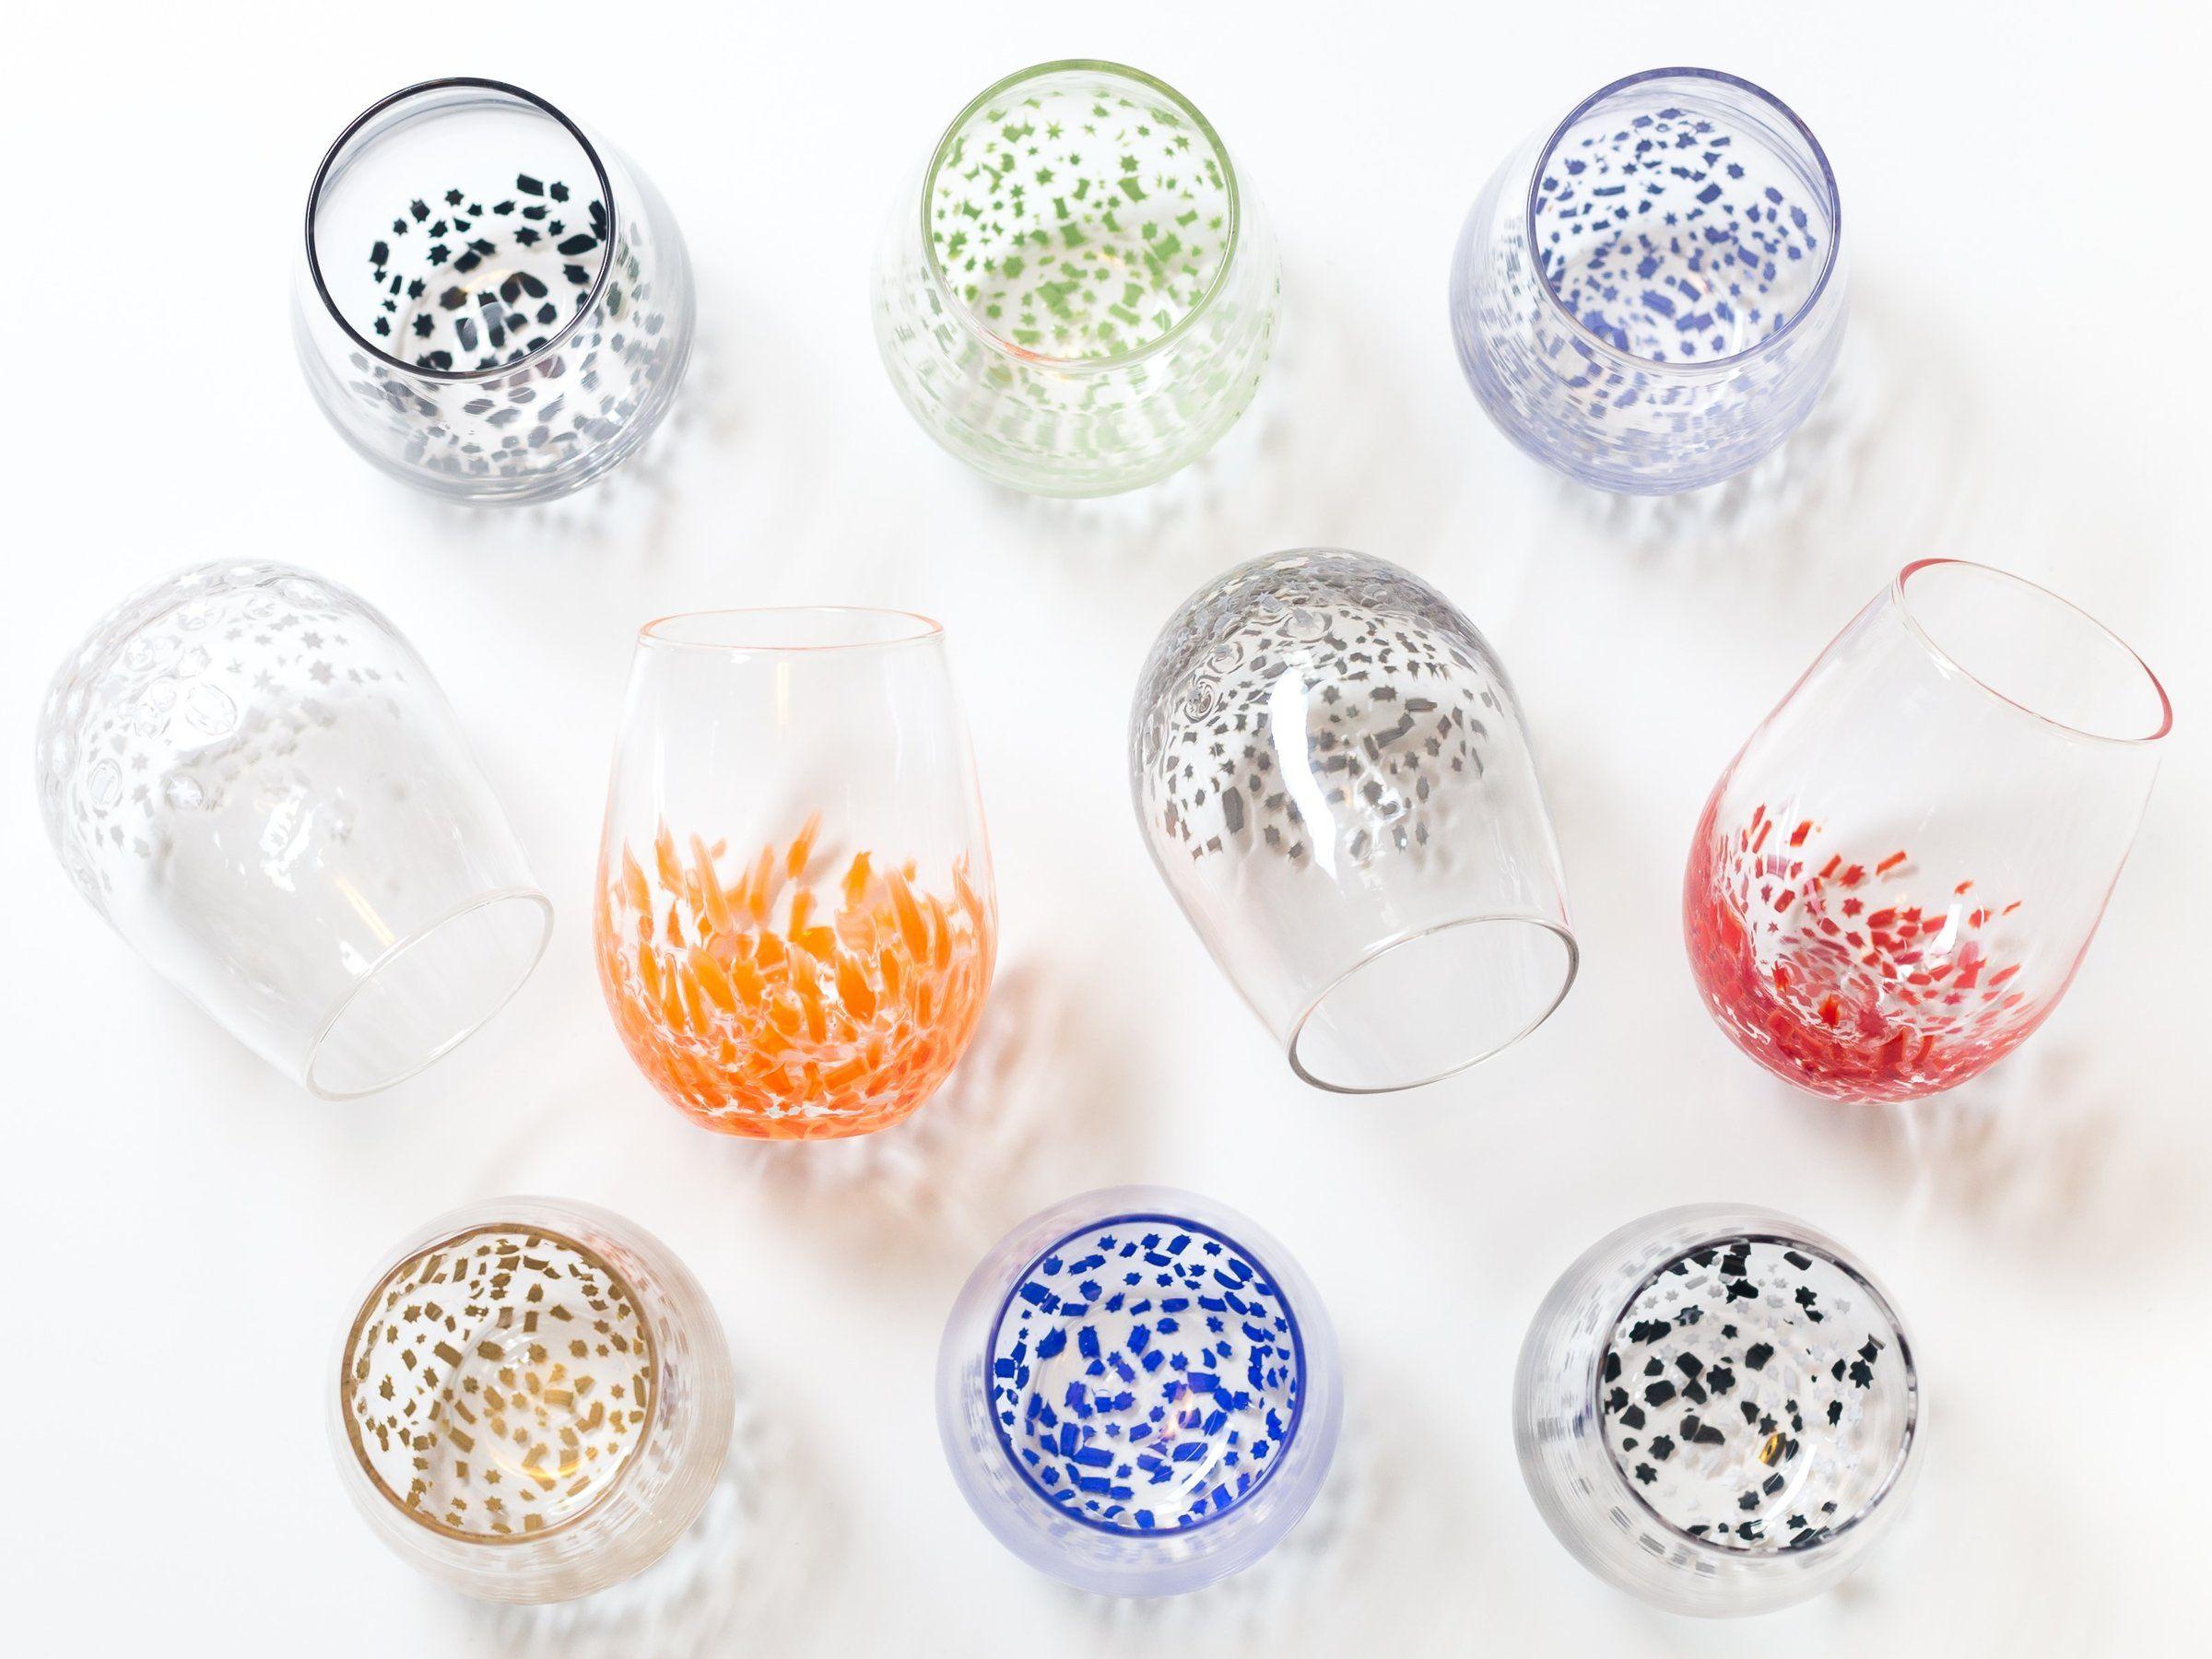 Small Star Wine Glasses By Aaron Baigelman Art Glass Drinkware